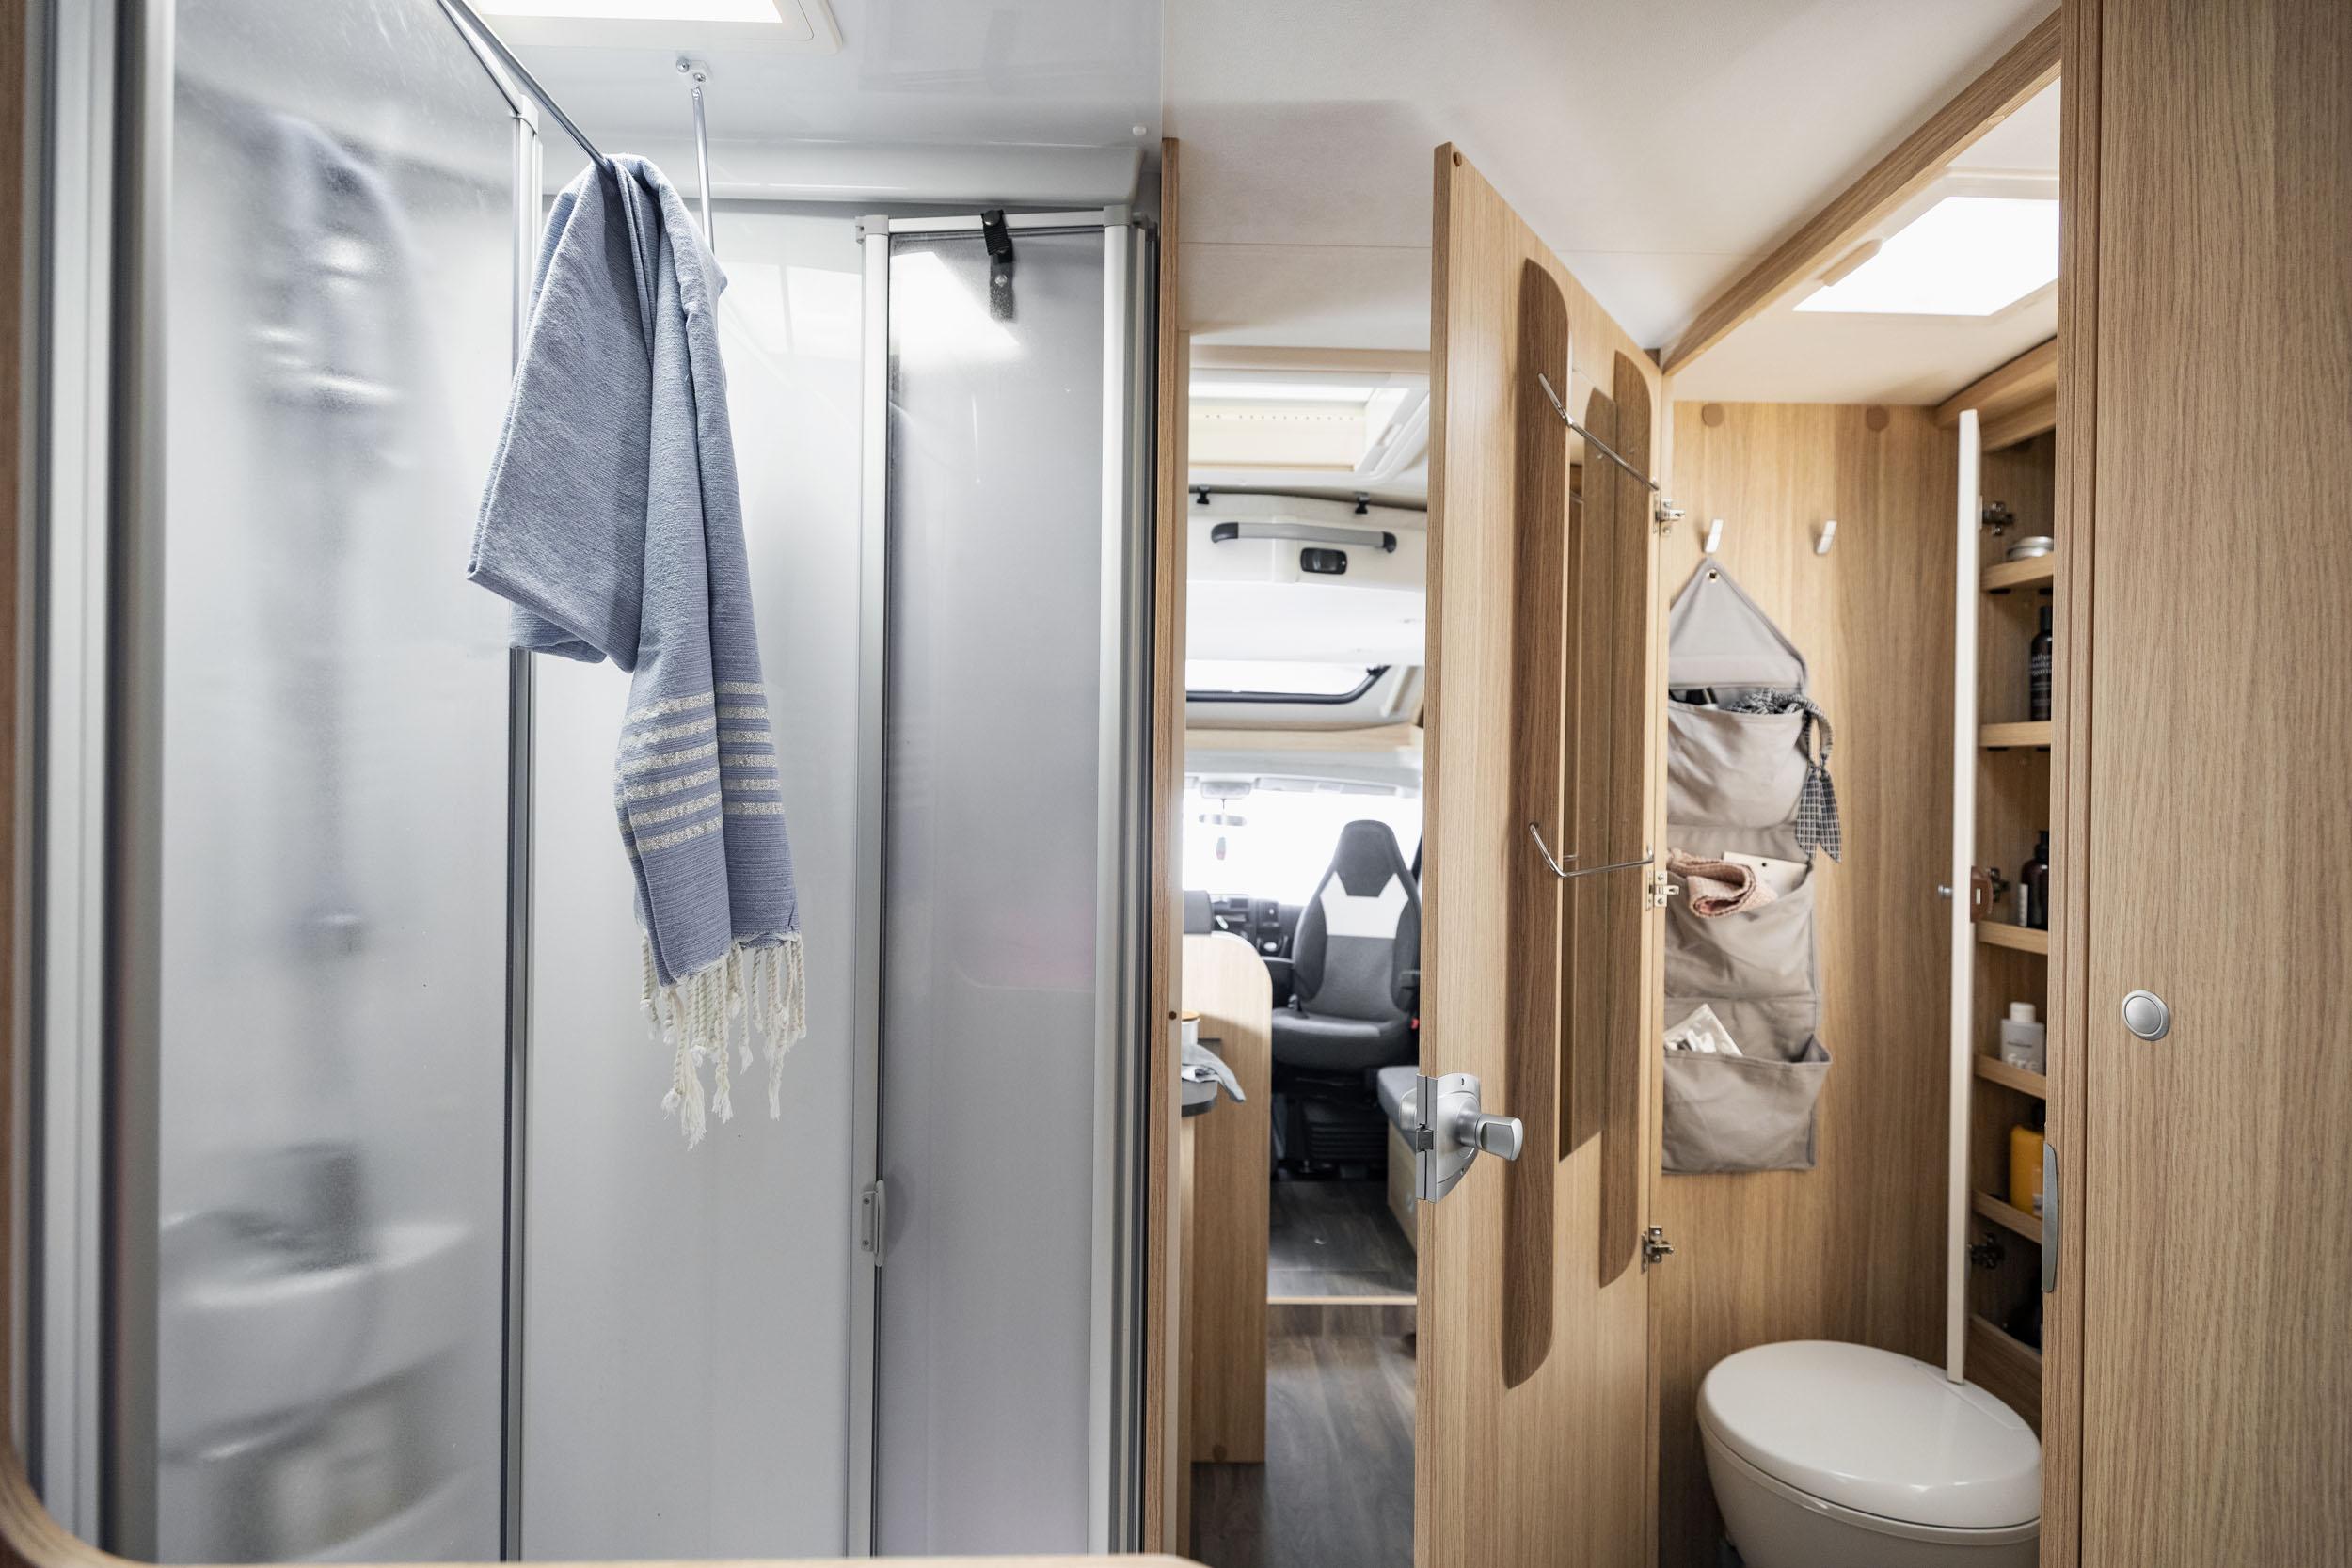 Comfort Luxury bad og toilet